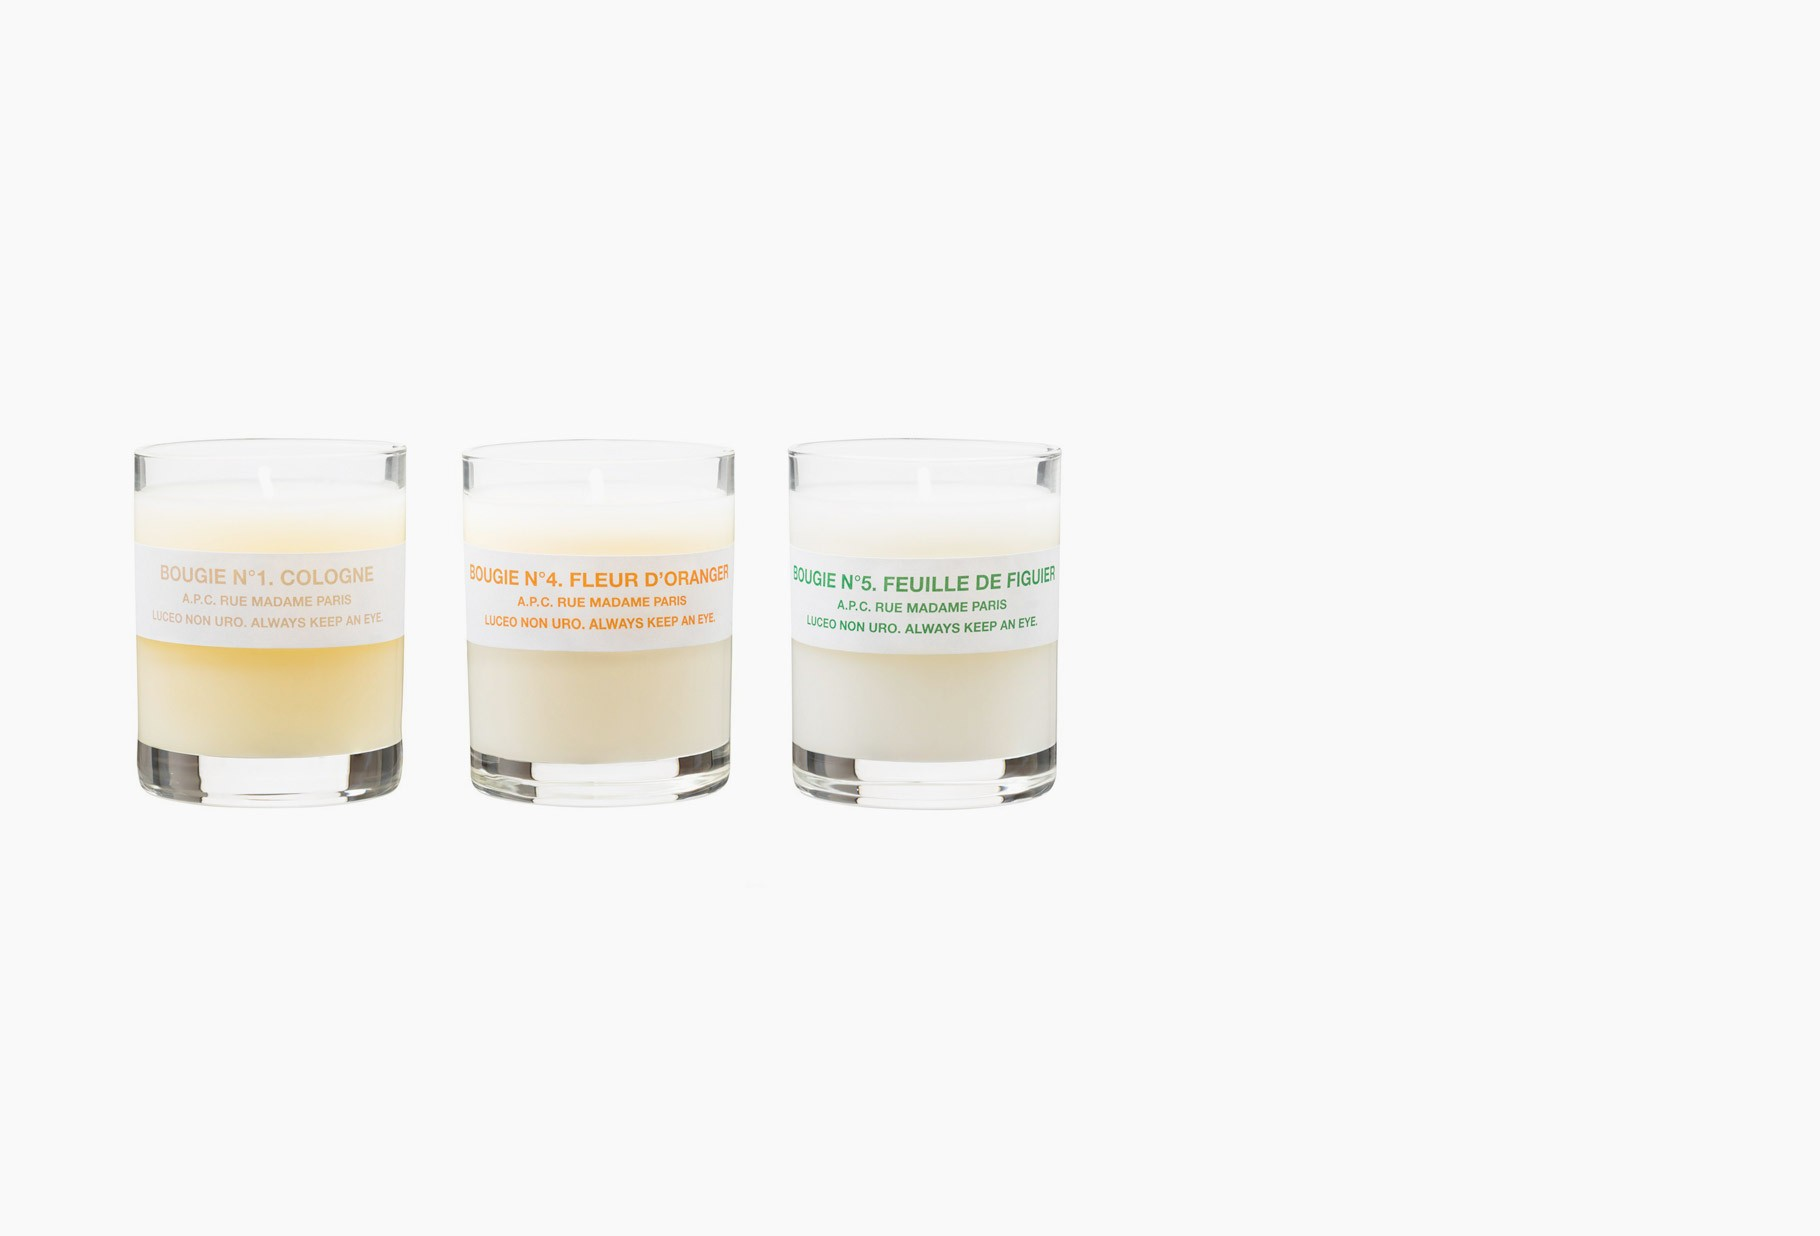 A.P.C. / Coffret petites bougies 1.4.5. Centon